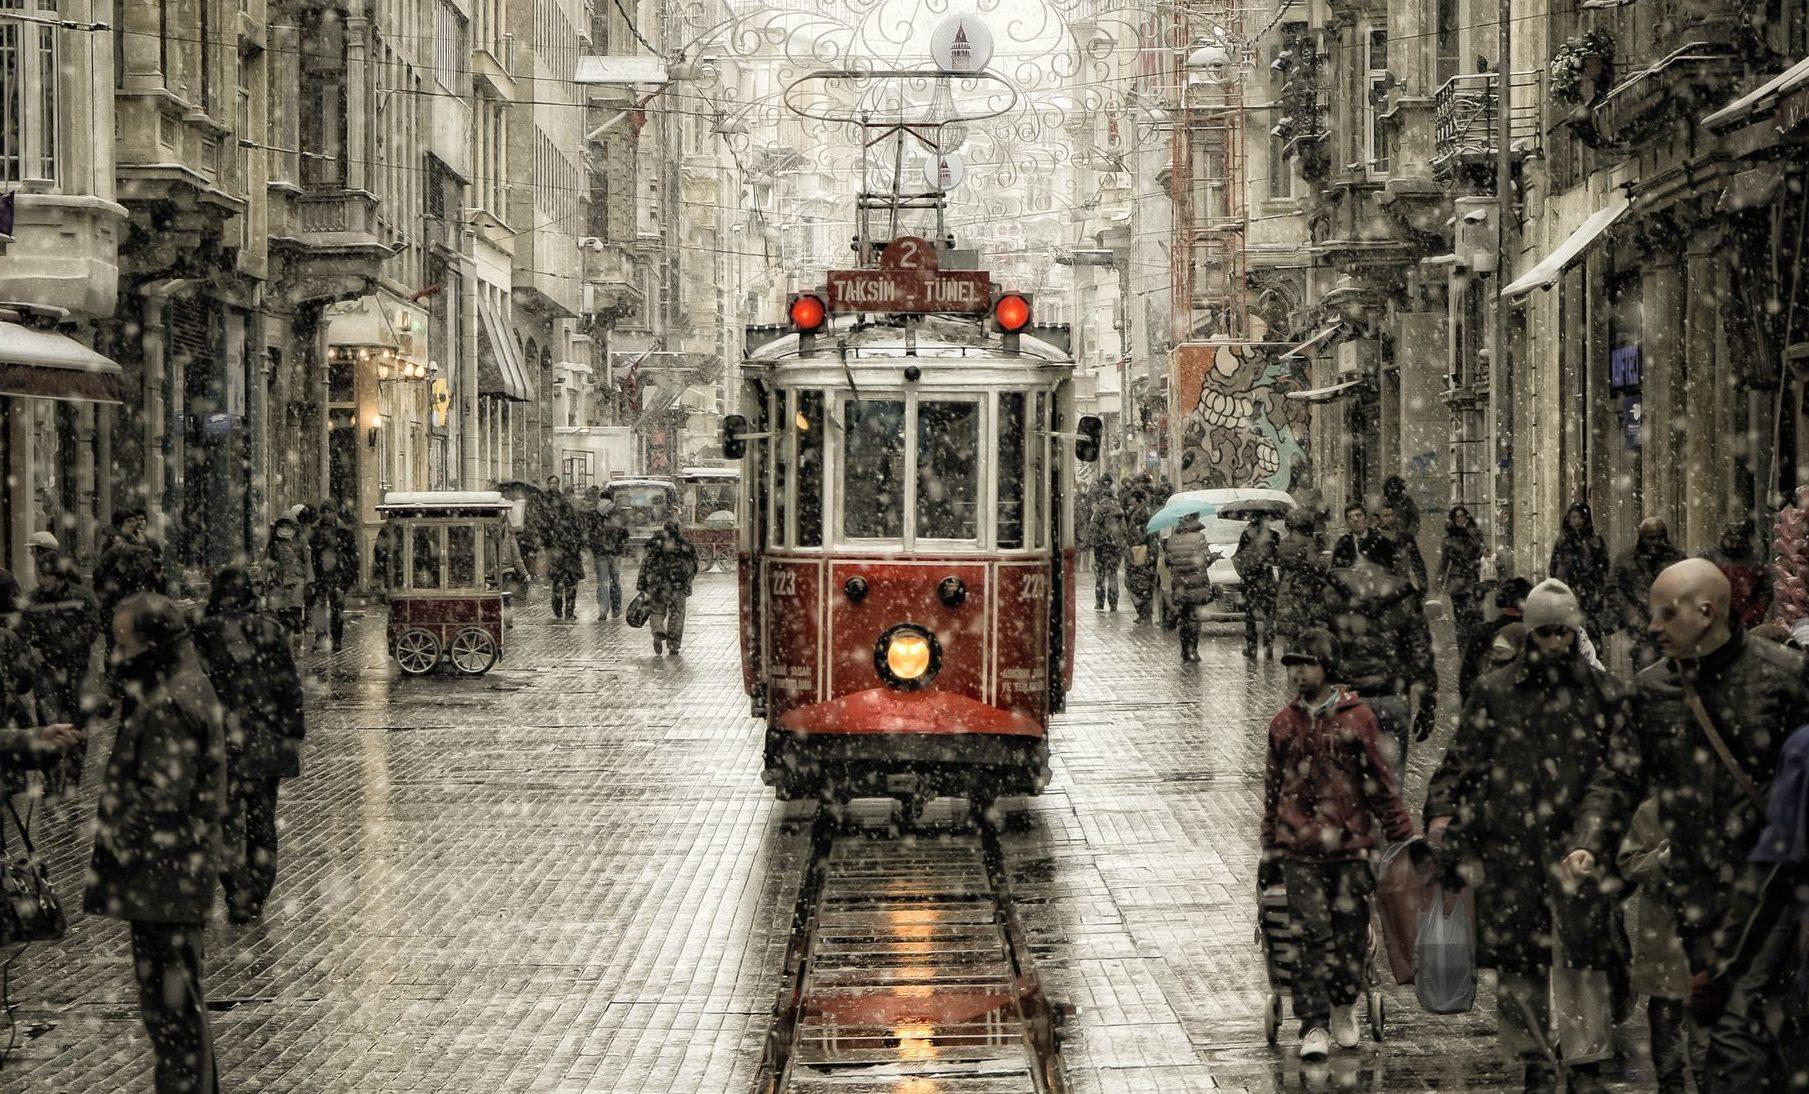 A Nostalcig Street in Beyoglu